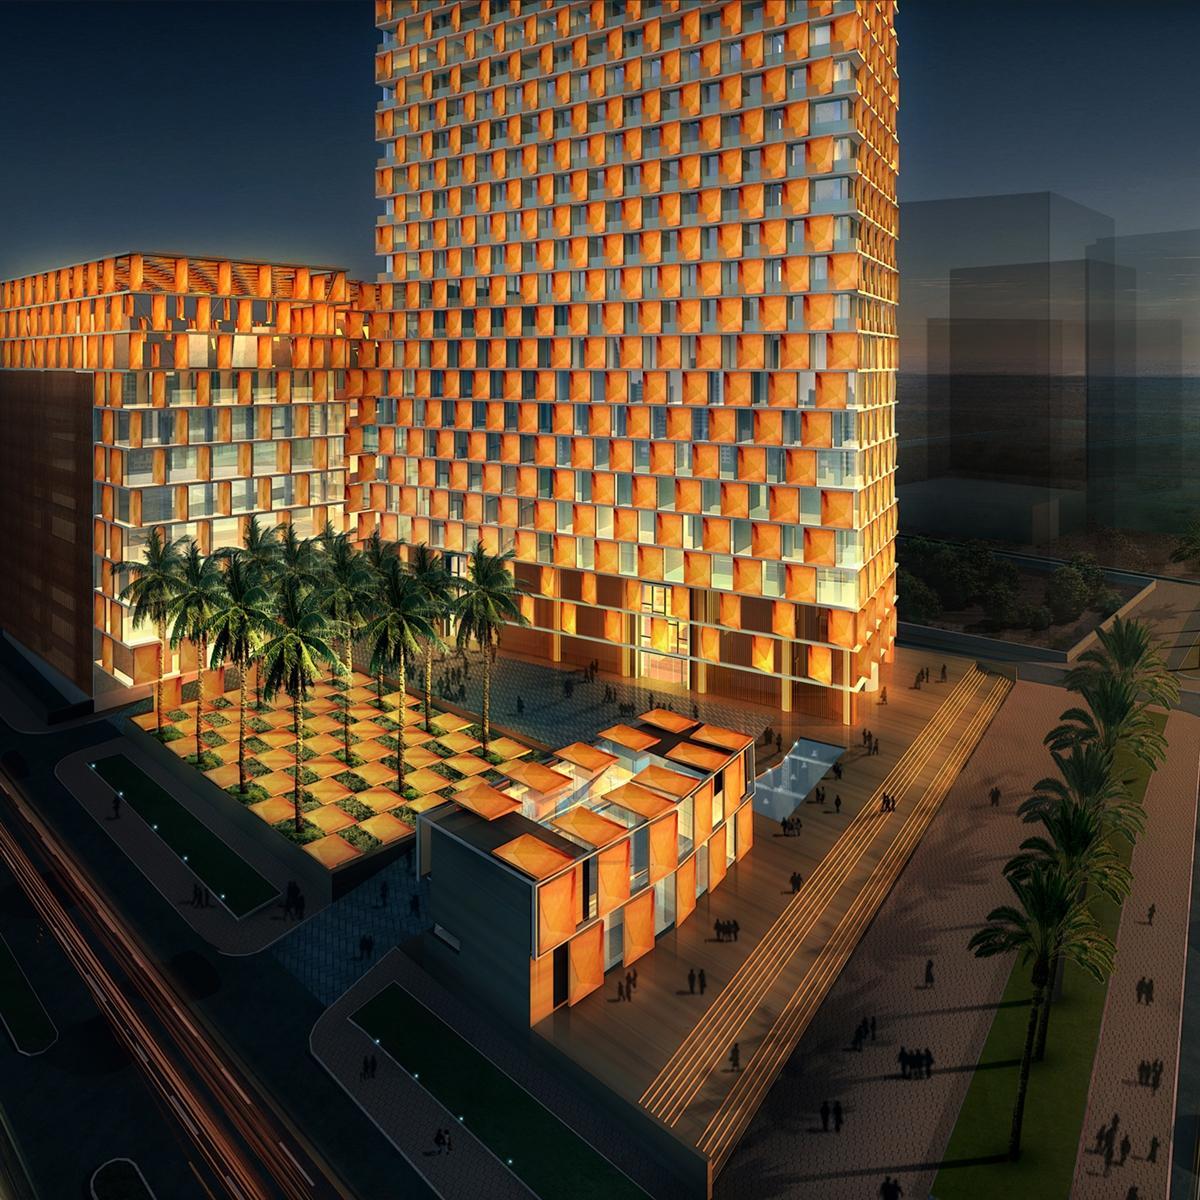 Shangri-La Hotel Project - Jeddah1